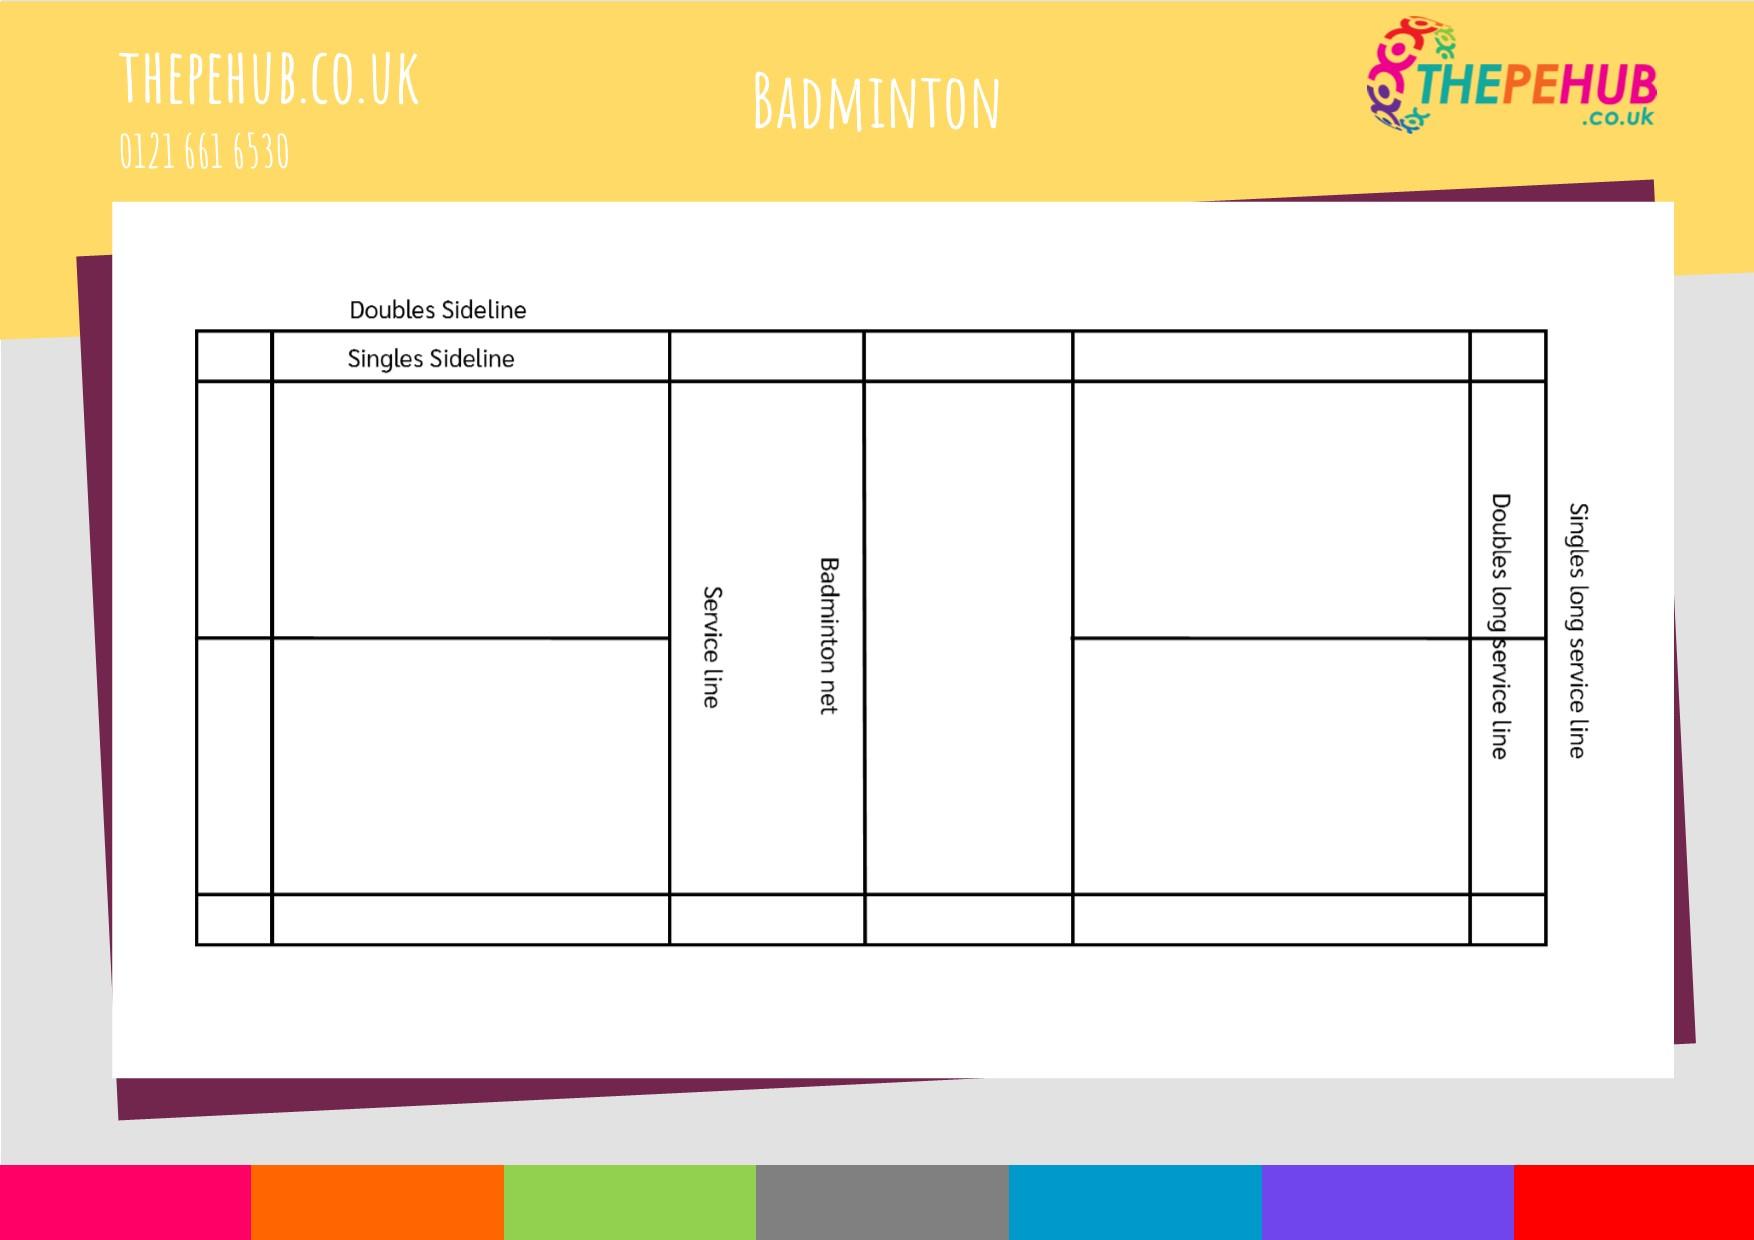 School games badminton court layout